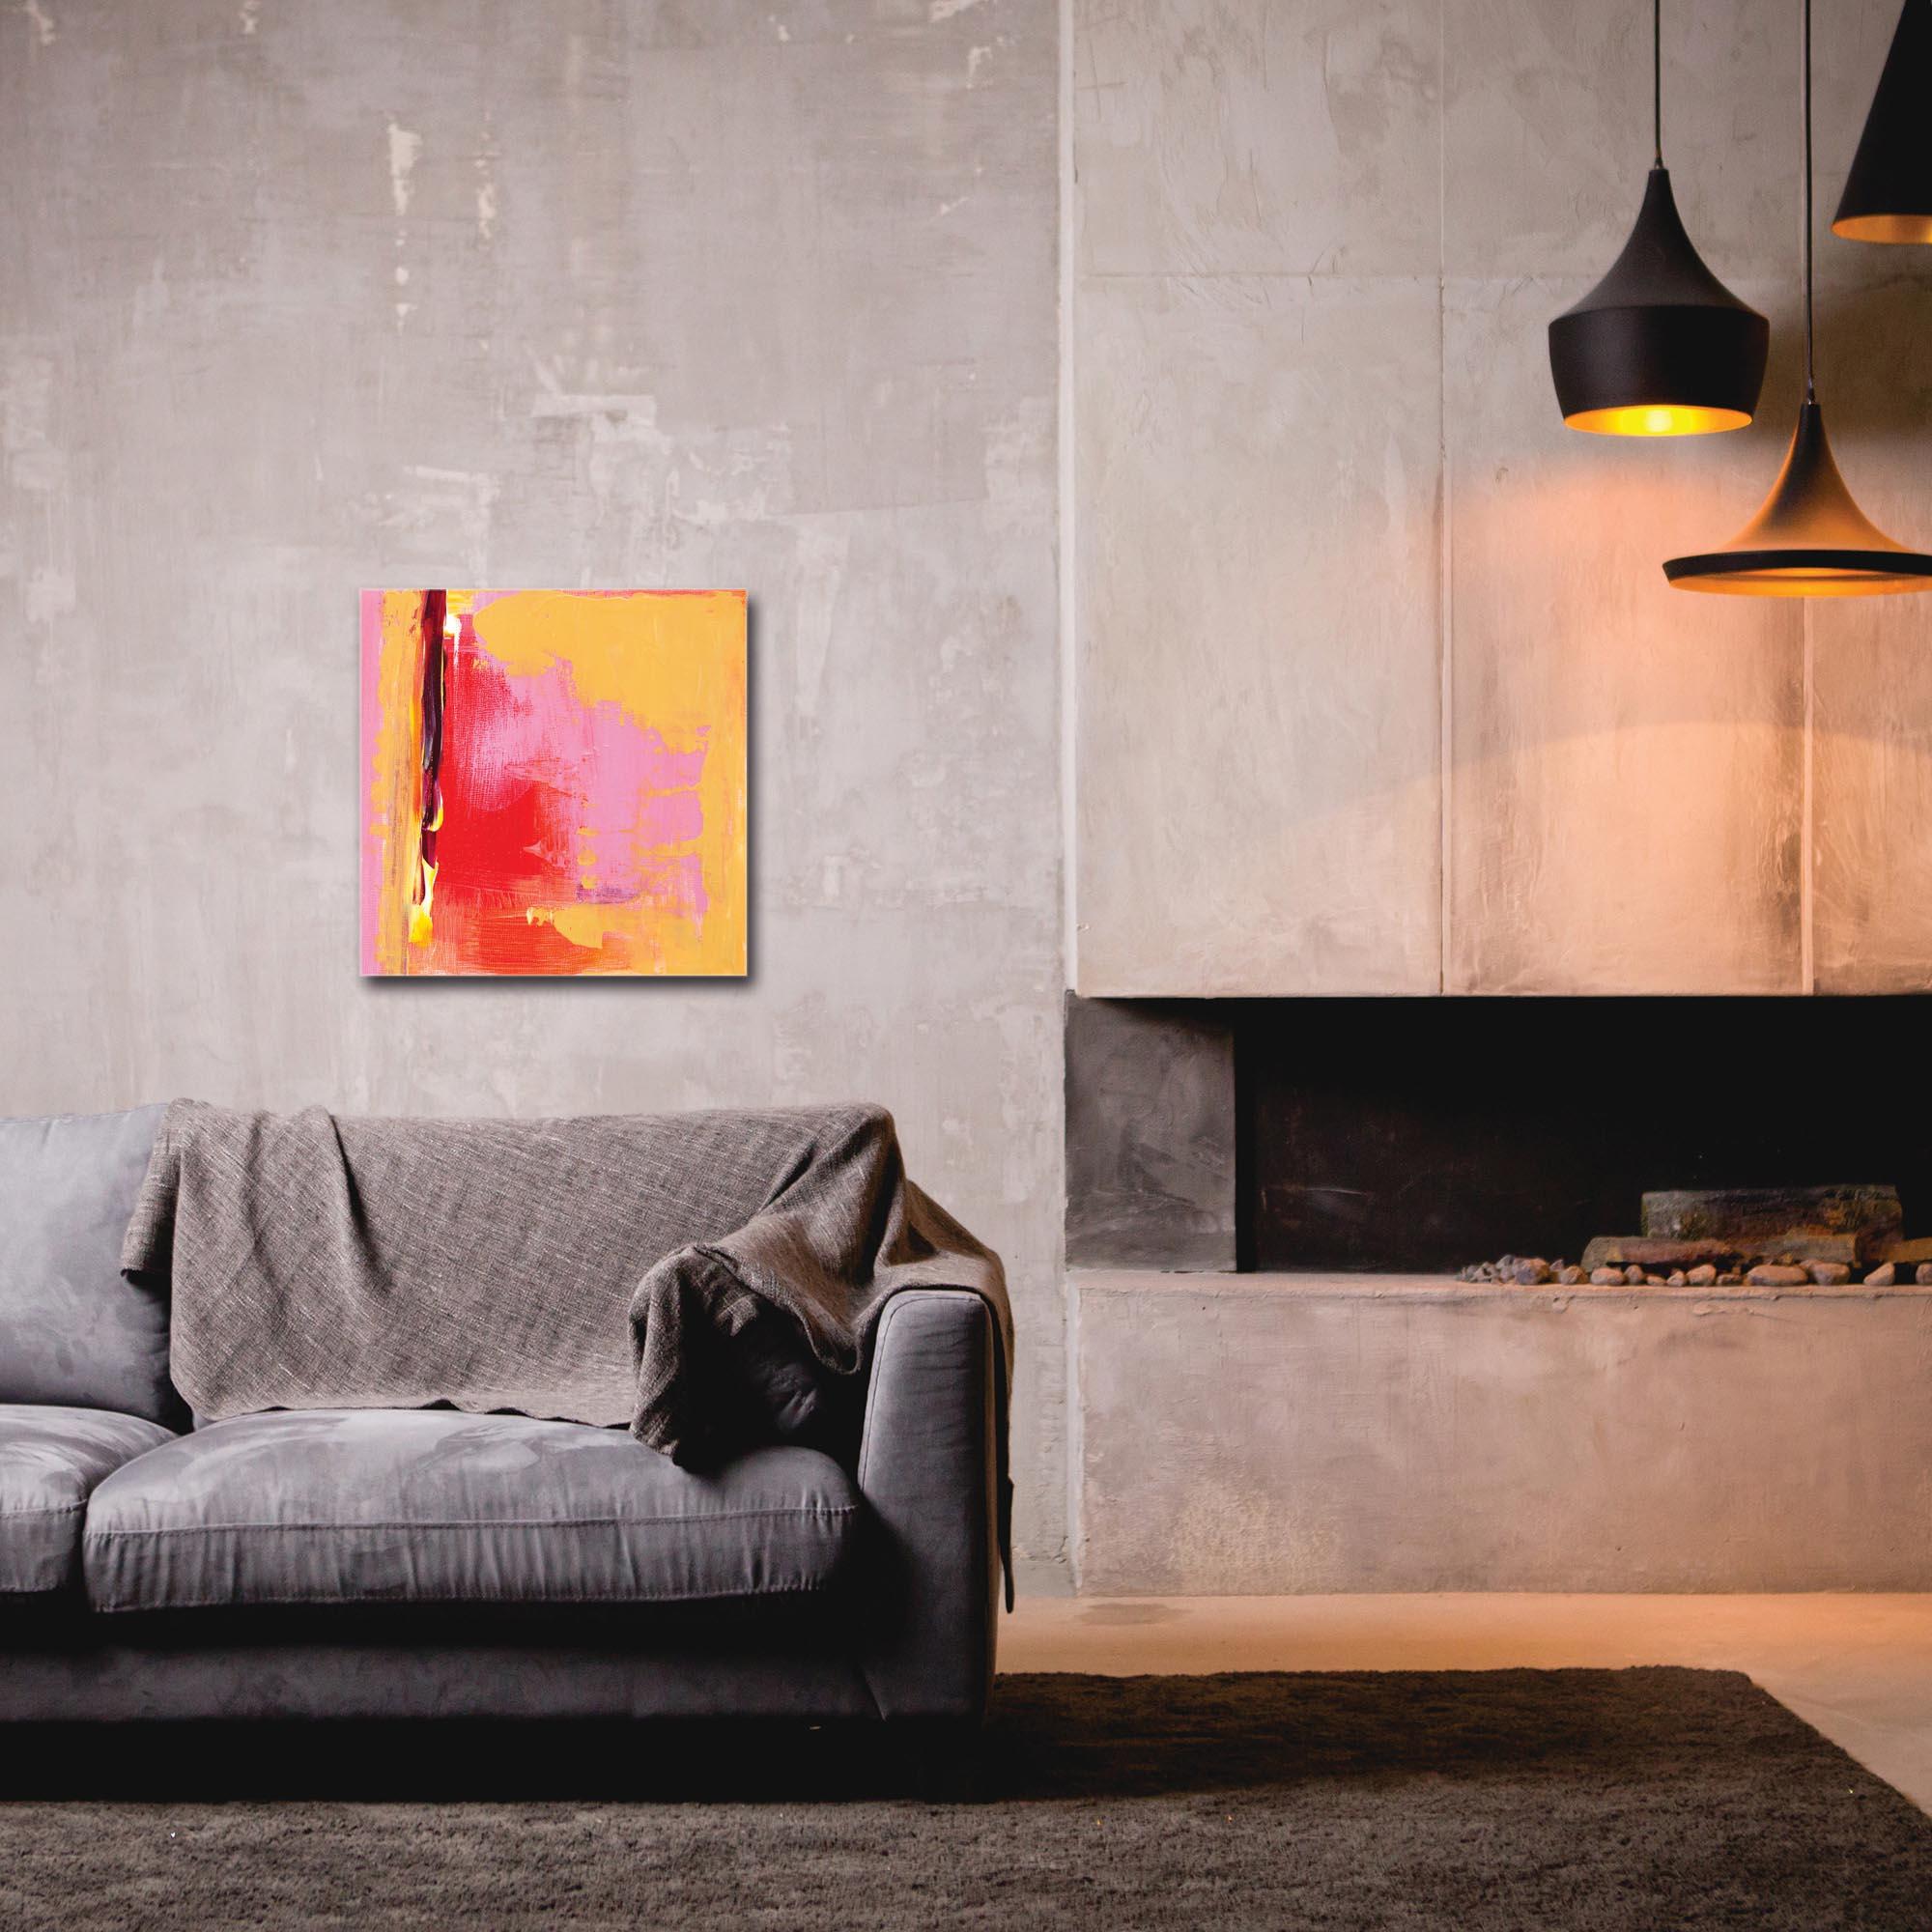 Abstract Wall Art 'Urban Life 6' - Urban Decor on Metal or Plexiglass - Image 3